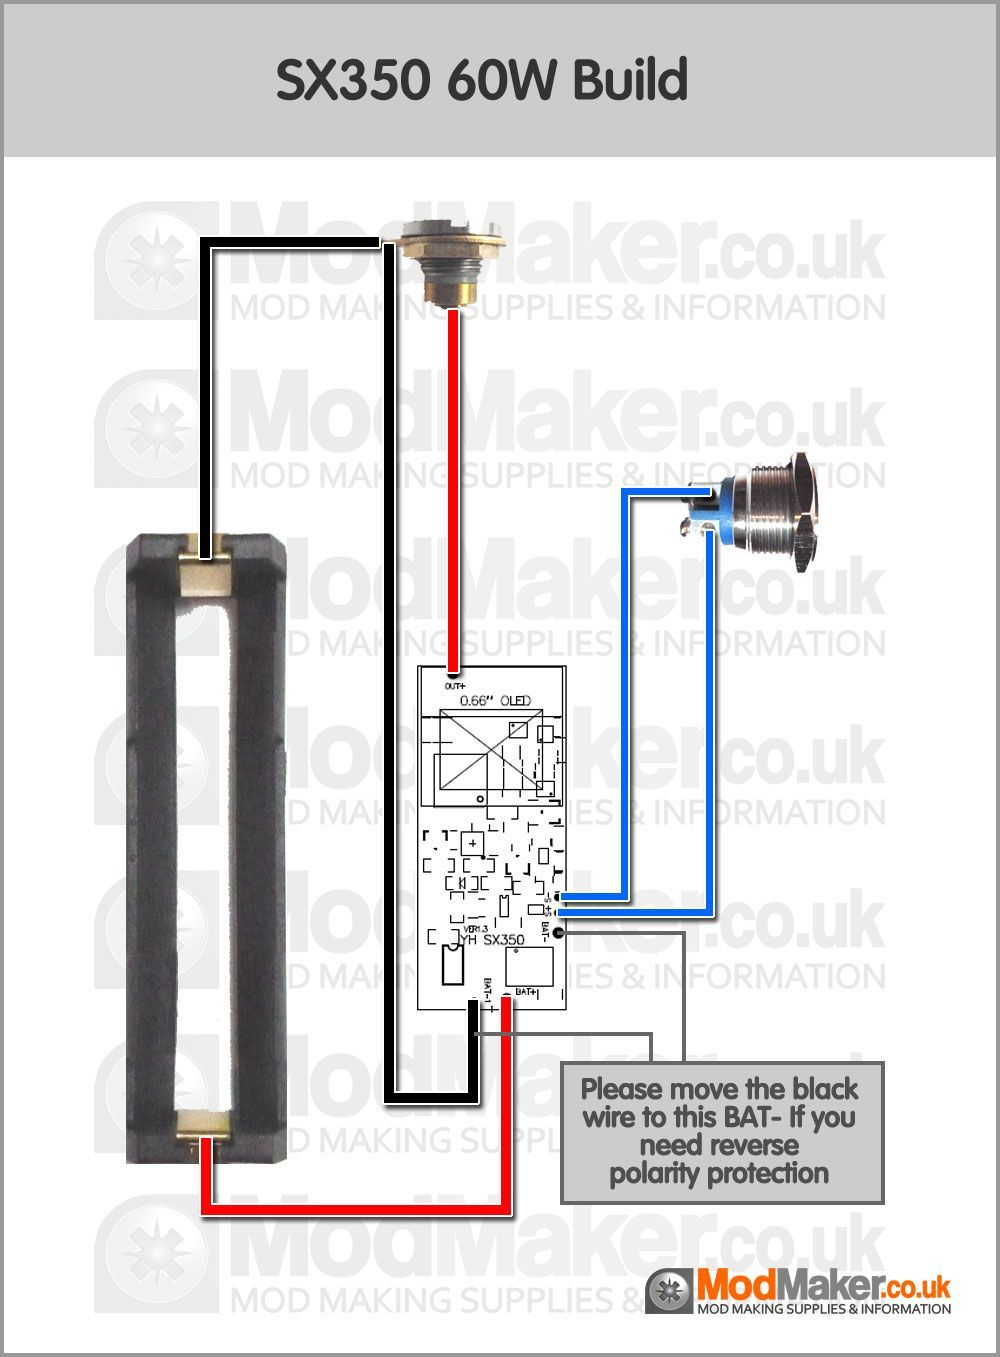 small resolution of sx350 60w wiring diagram vape in 2019 vape box vape coils diysx350 60w wiring